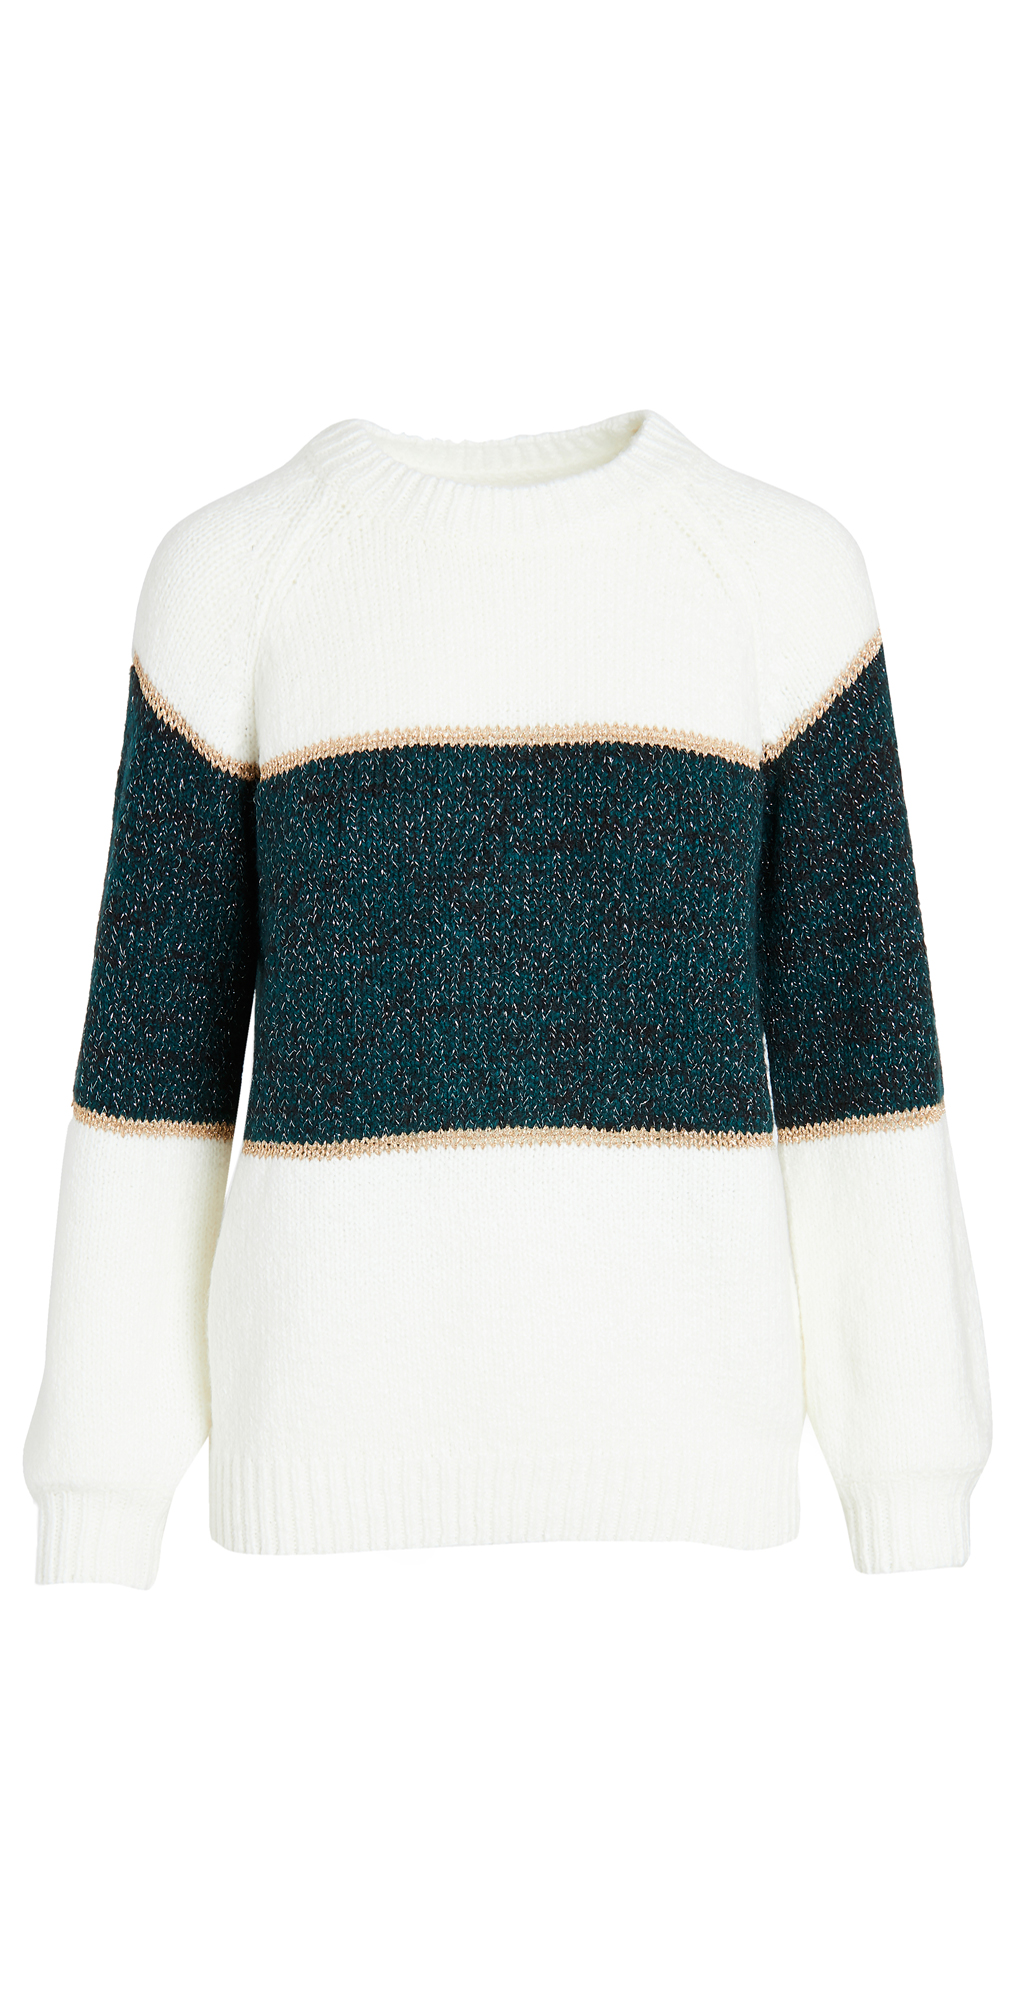 BB Dakota Aesthetic Dept. Sweater